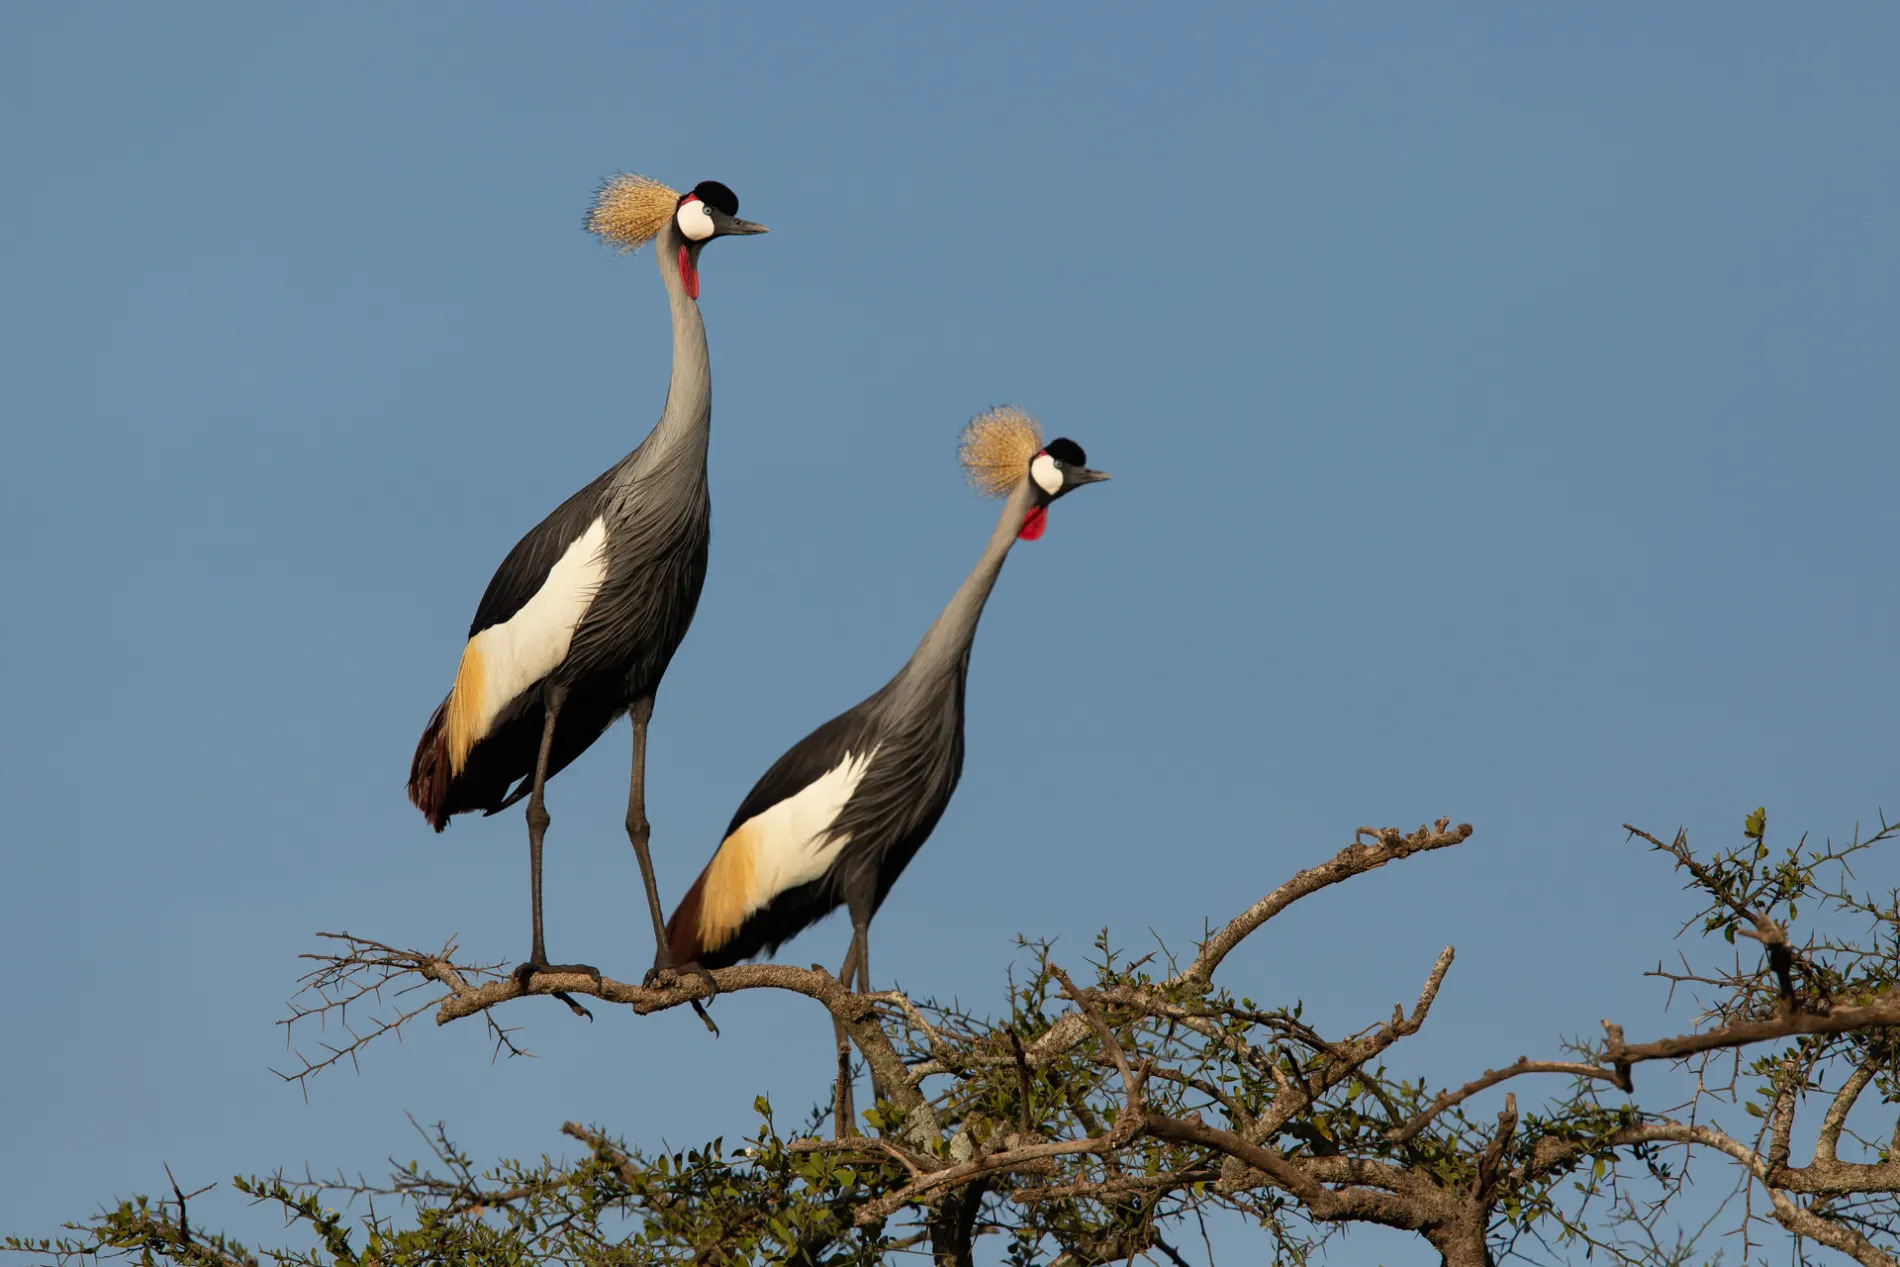 Cranes in tree